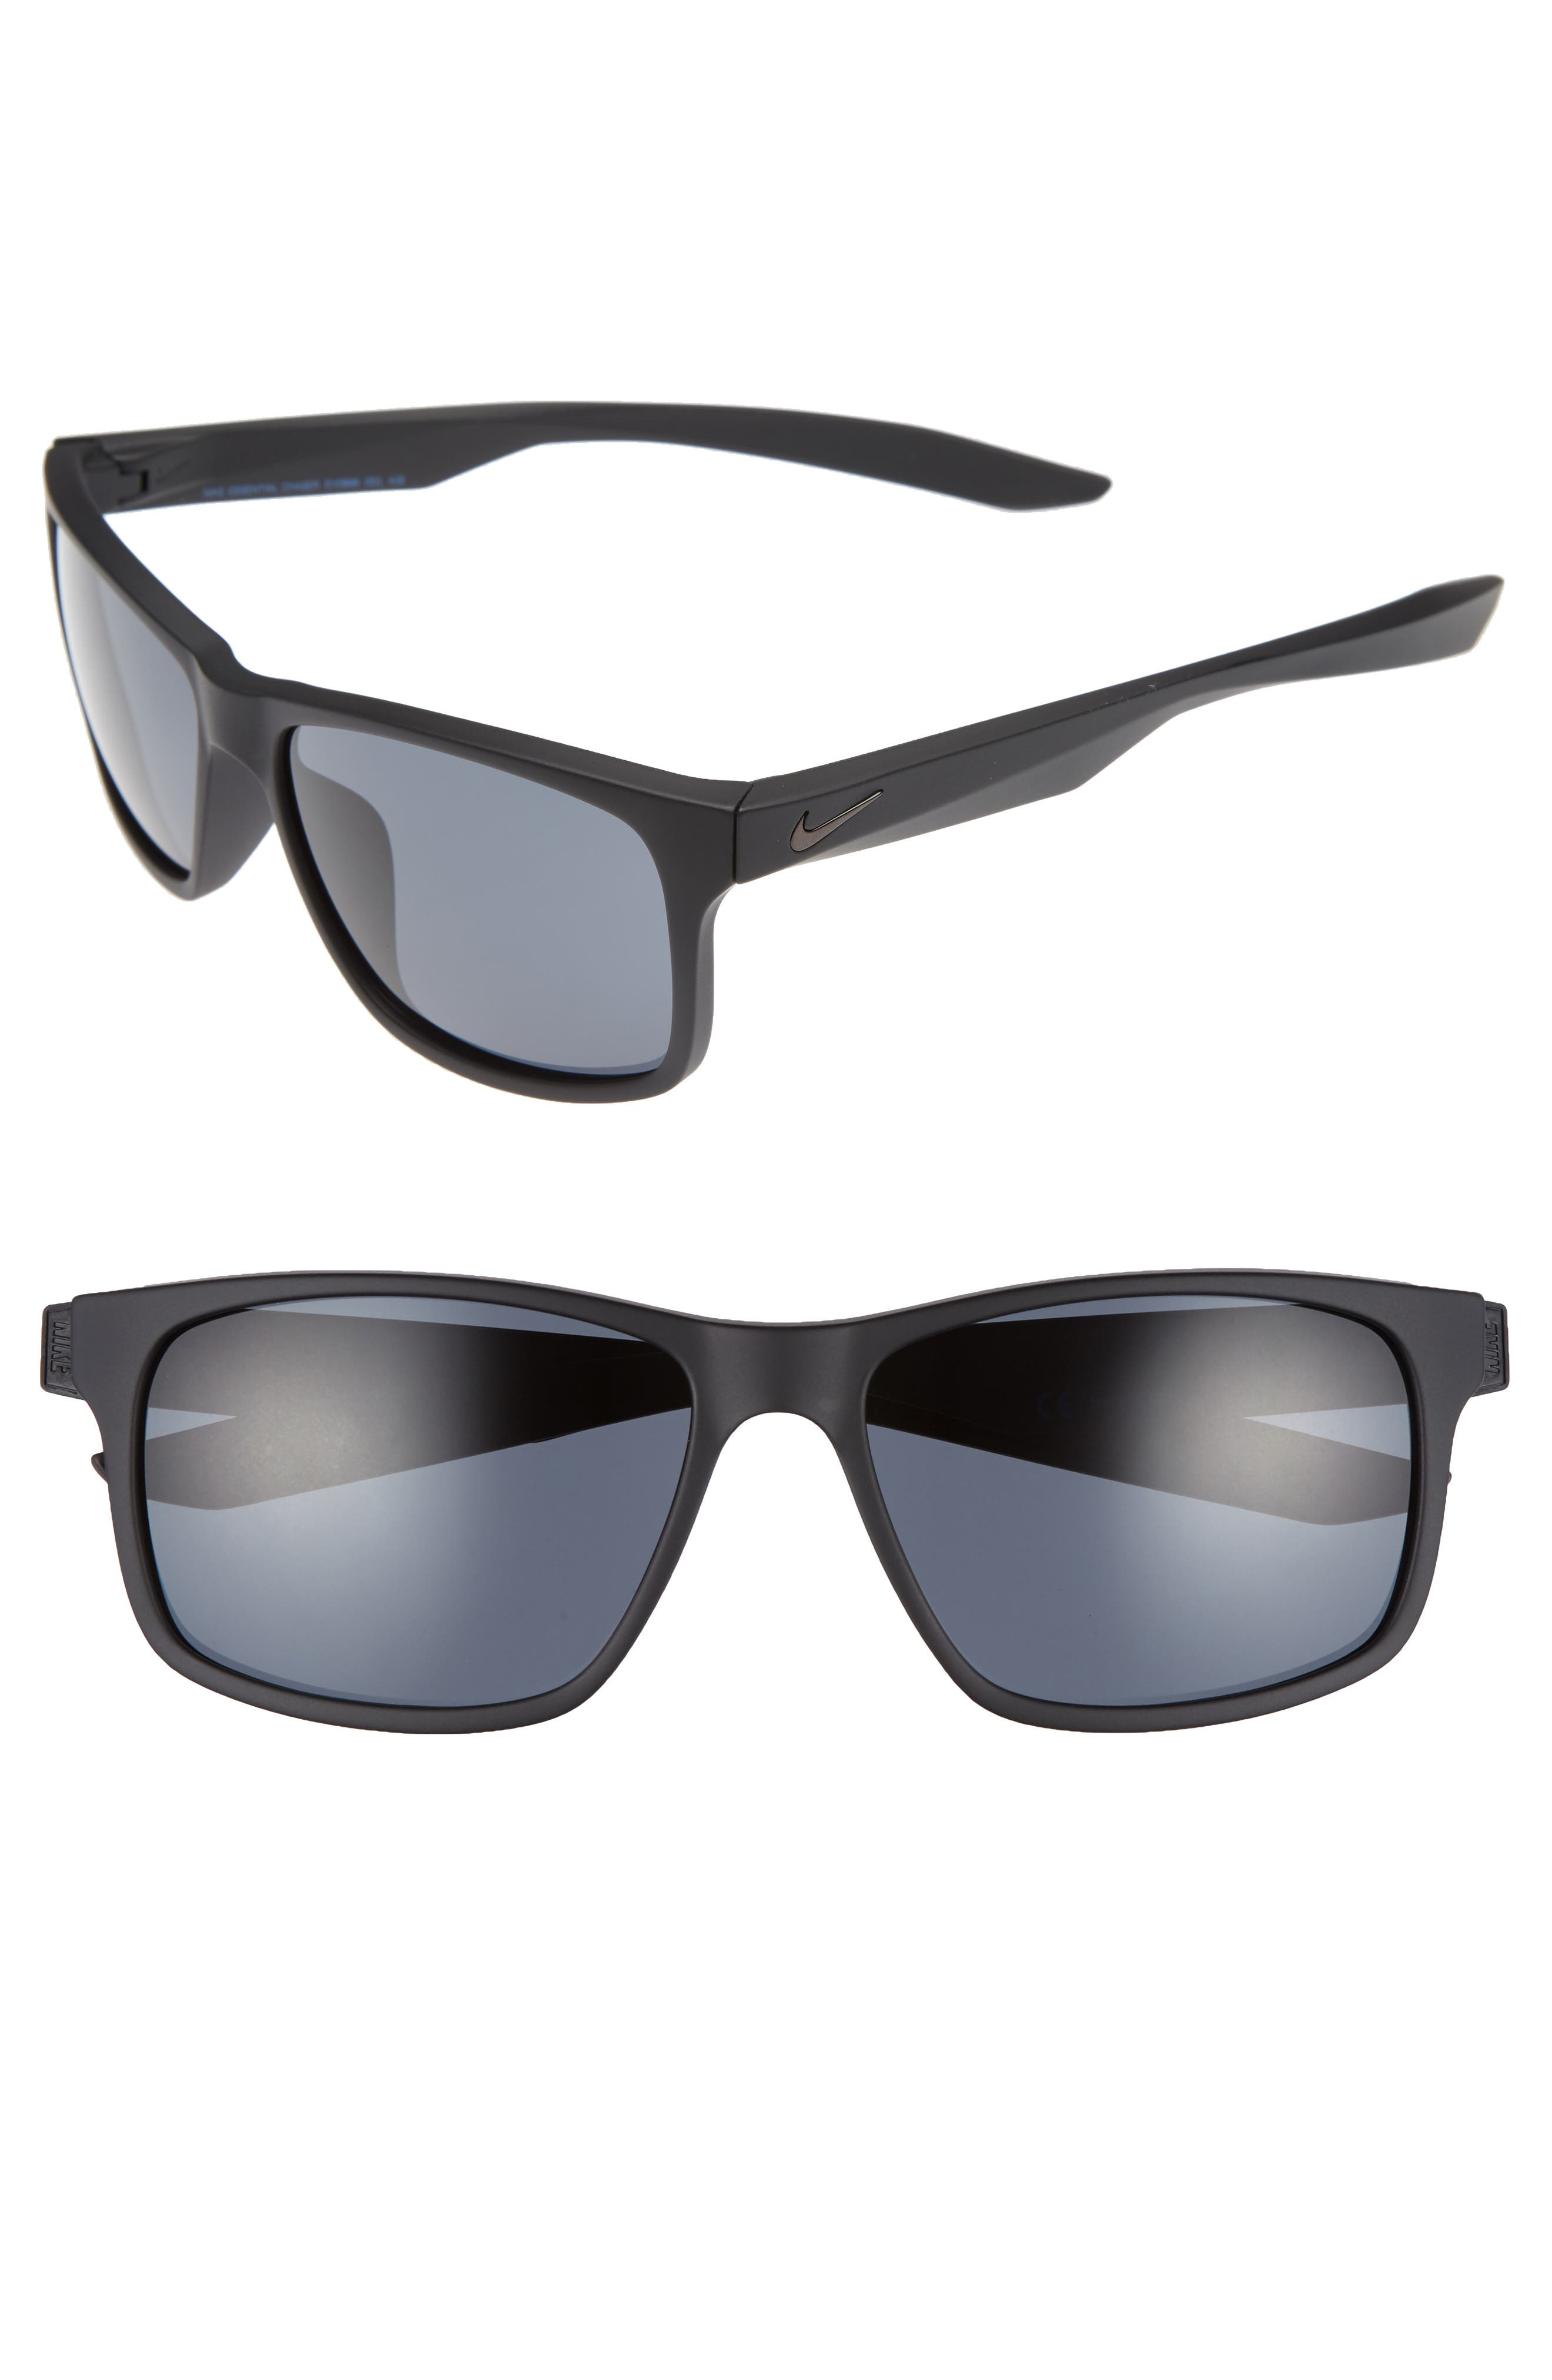 Nike Essential Chaser 5m Sunglasses - Matte Black/ Racer Blue